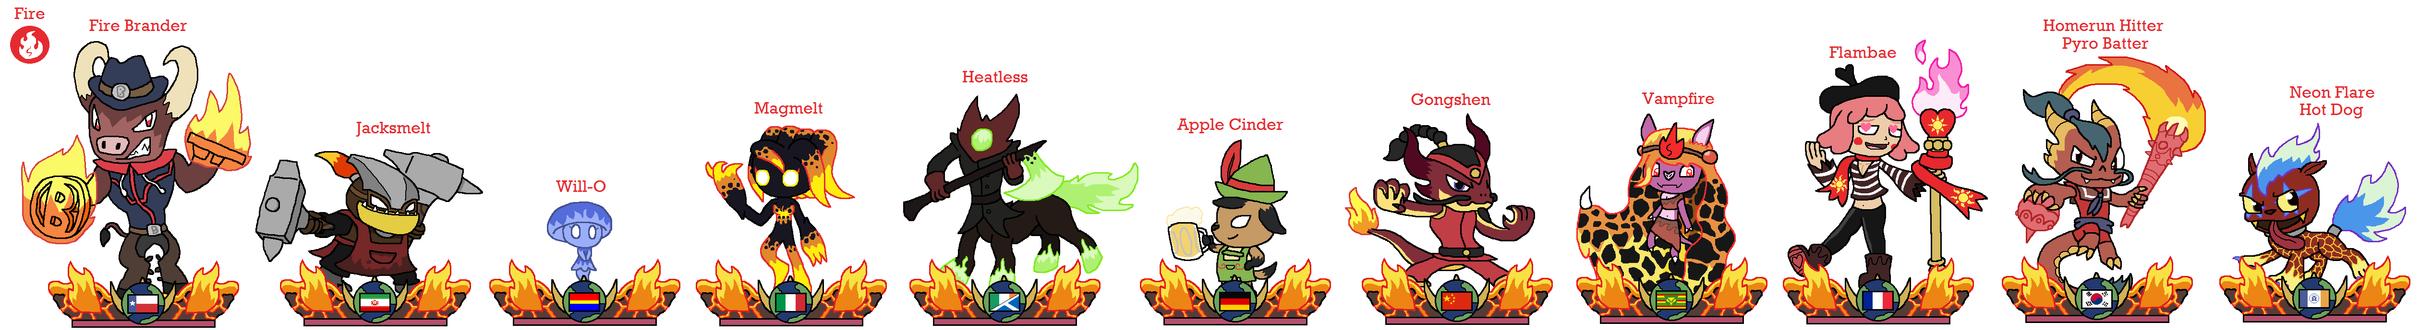 Skylanders World - Fire by JoltikLover